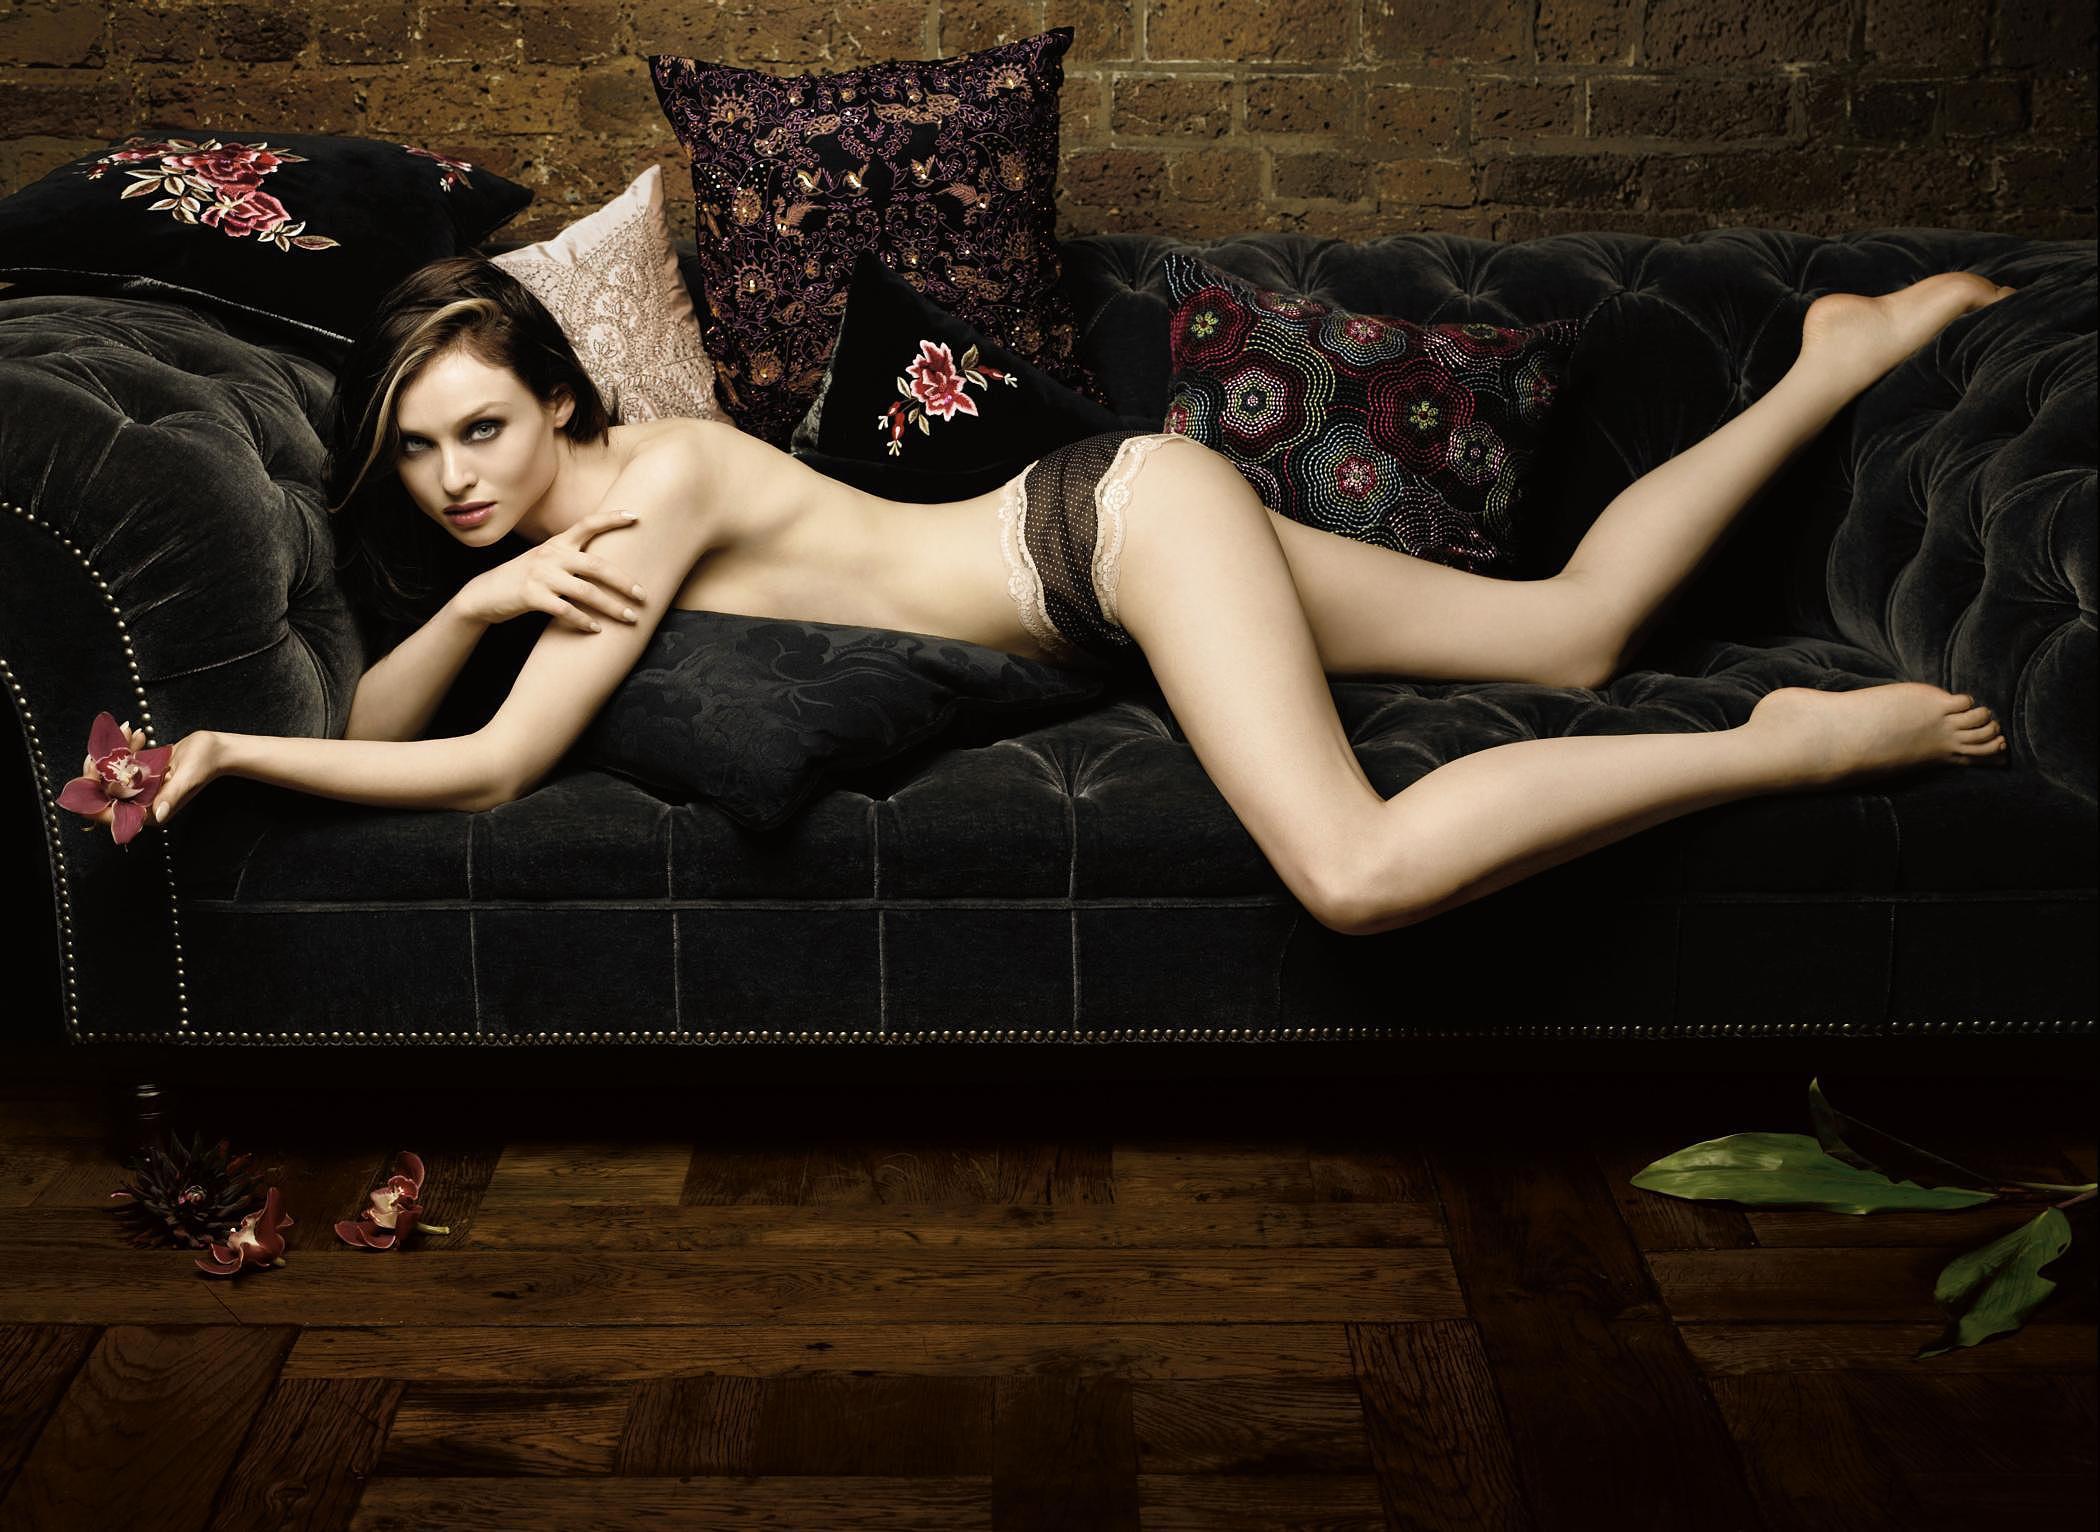 Foto de Sophie Ellis-Bextor  número 18339